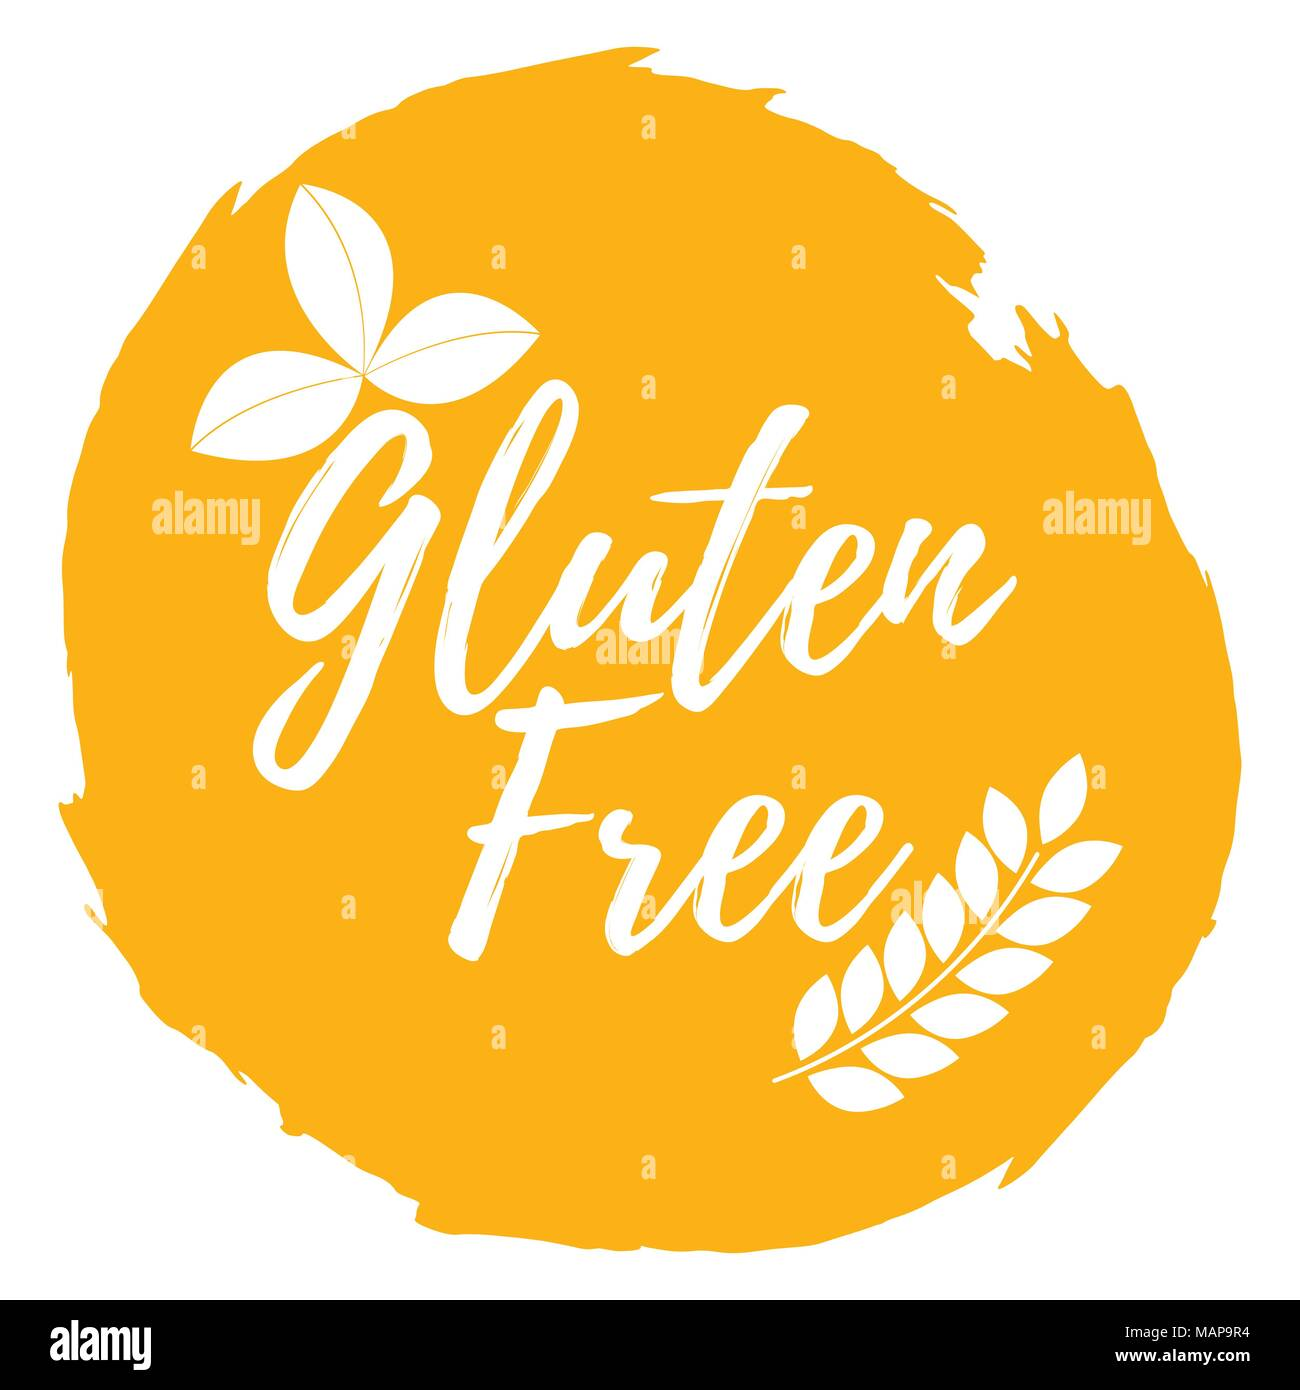 Gluten Free Label Stock Photos & Gluten Free Label Stock